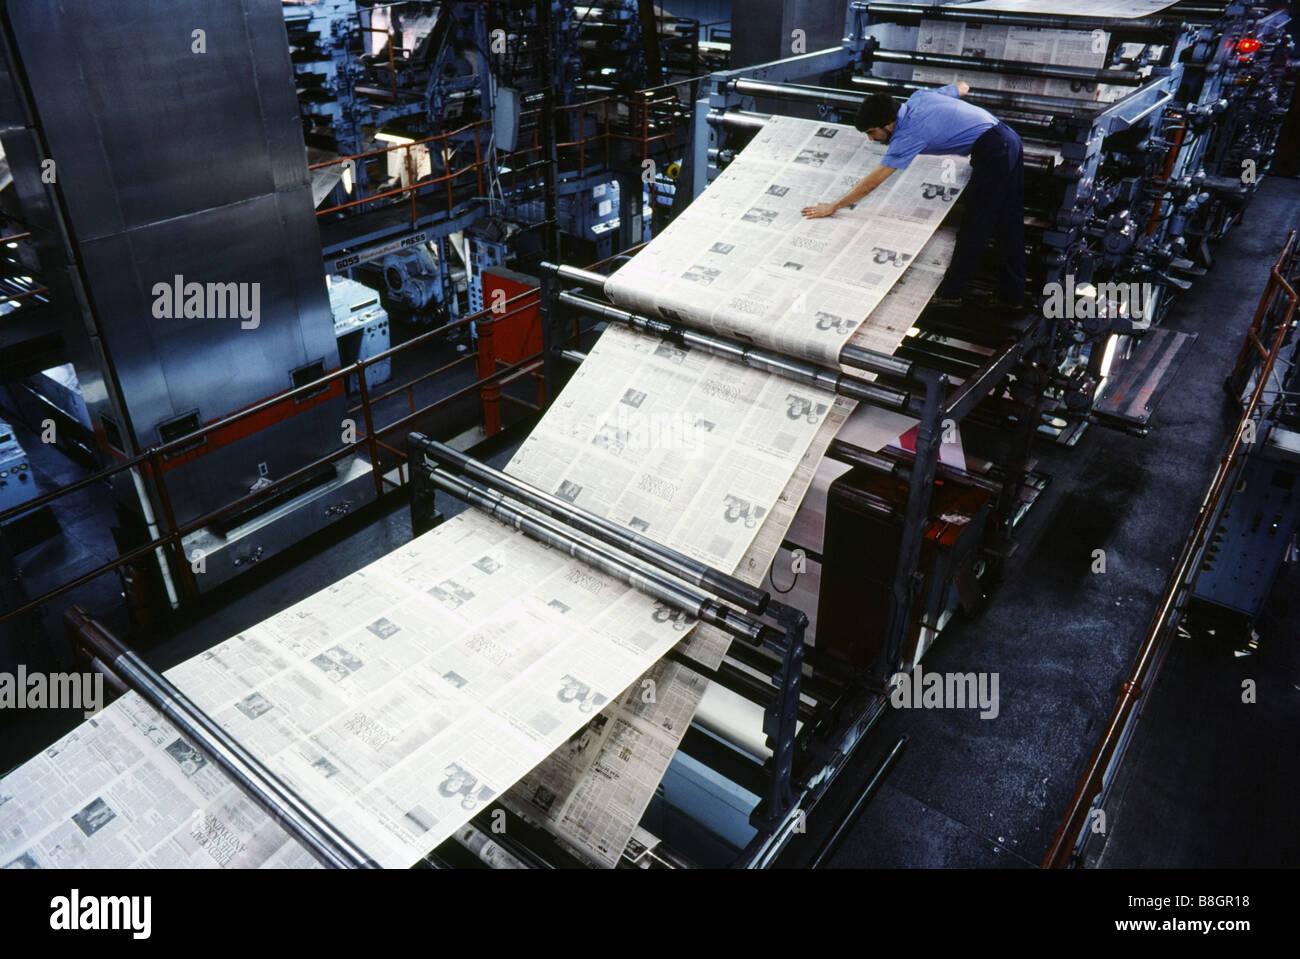 Color press printing - People Working Newspaper Printing On 4 Color Press Pressman Inspects Printed Paper